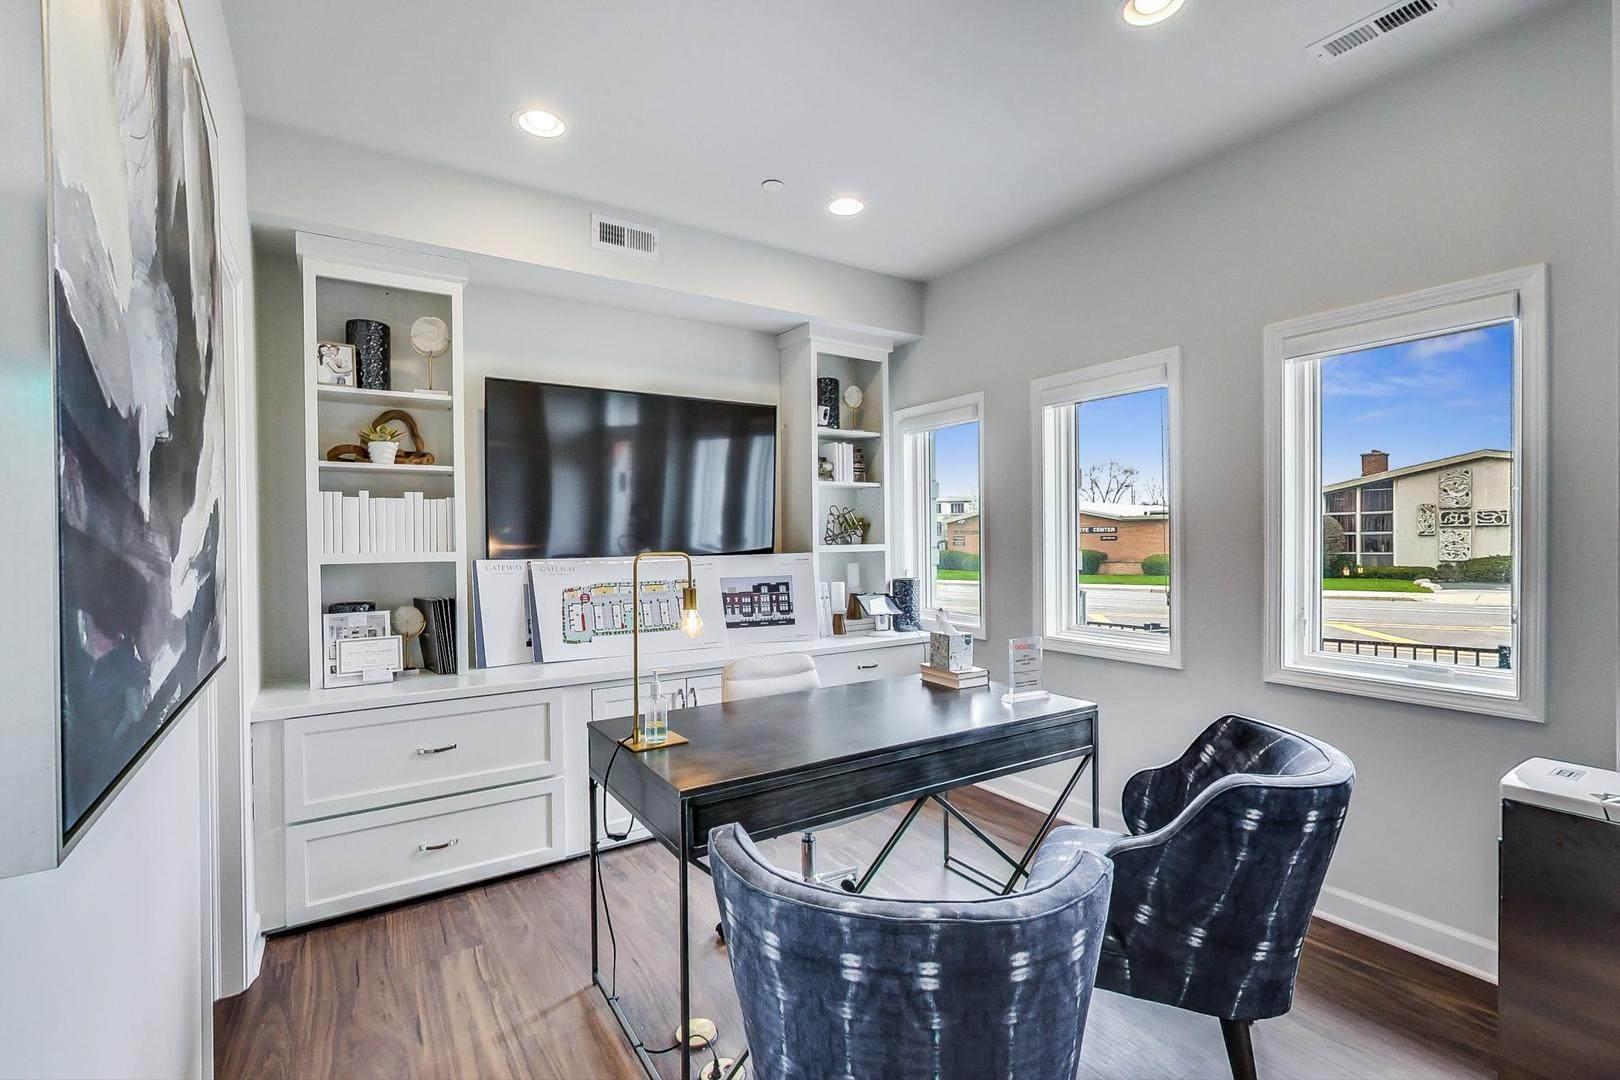 1261 Shermer Road, Northbrook, IL 60062 (MLS #10842177) :: Littlefield Group